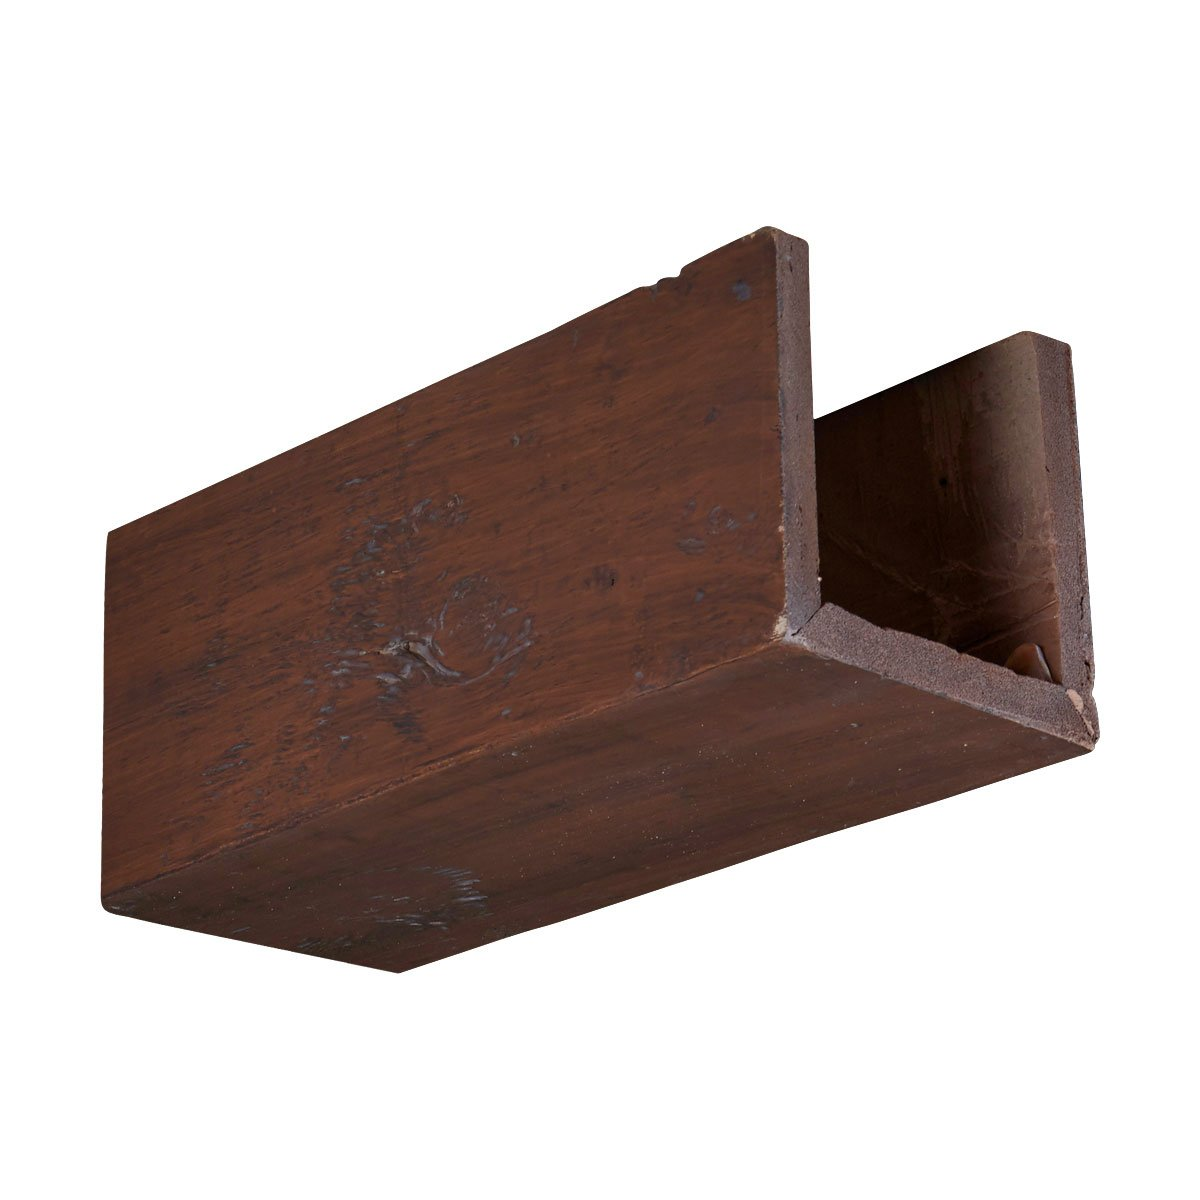 Ekena Millwork BMKPBC-MAT W x 6 H Knotty Pine Endurathane Faux Wood Ceiling Beam Material Sample Black Cherry Finish